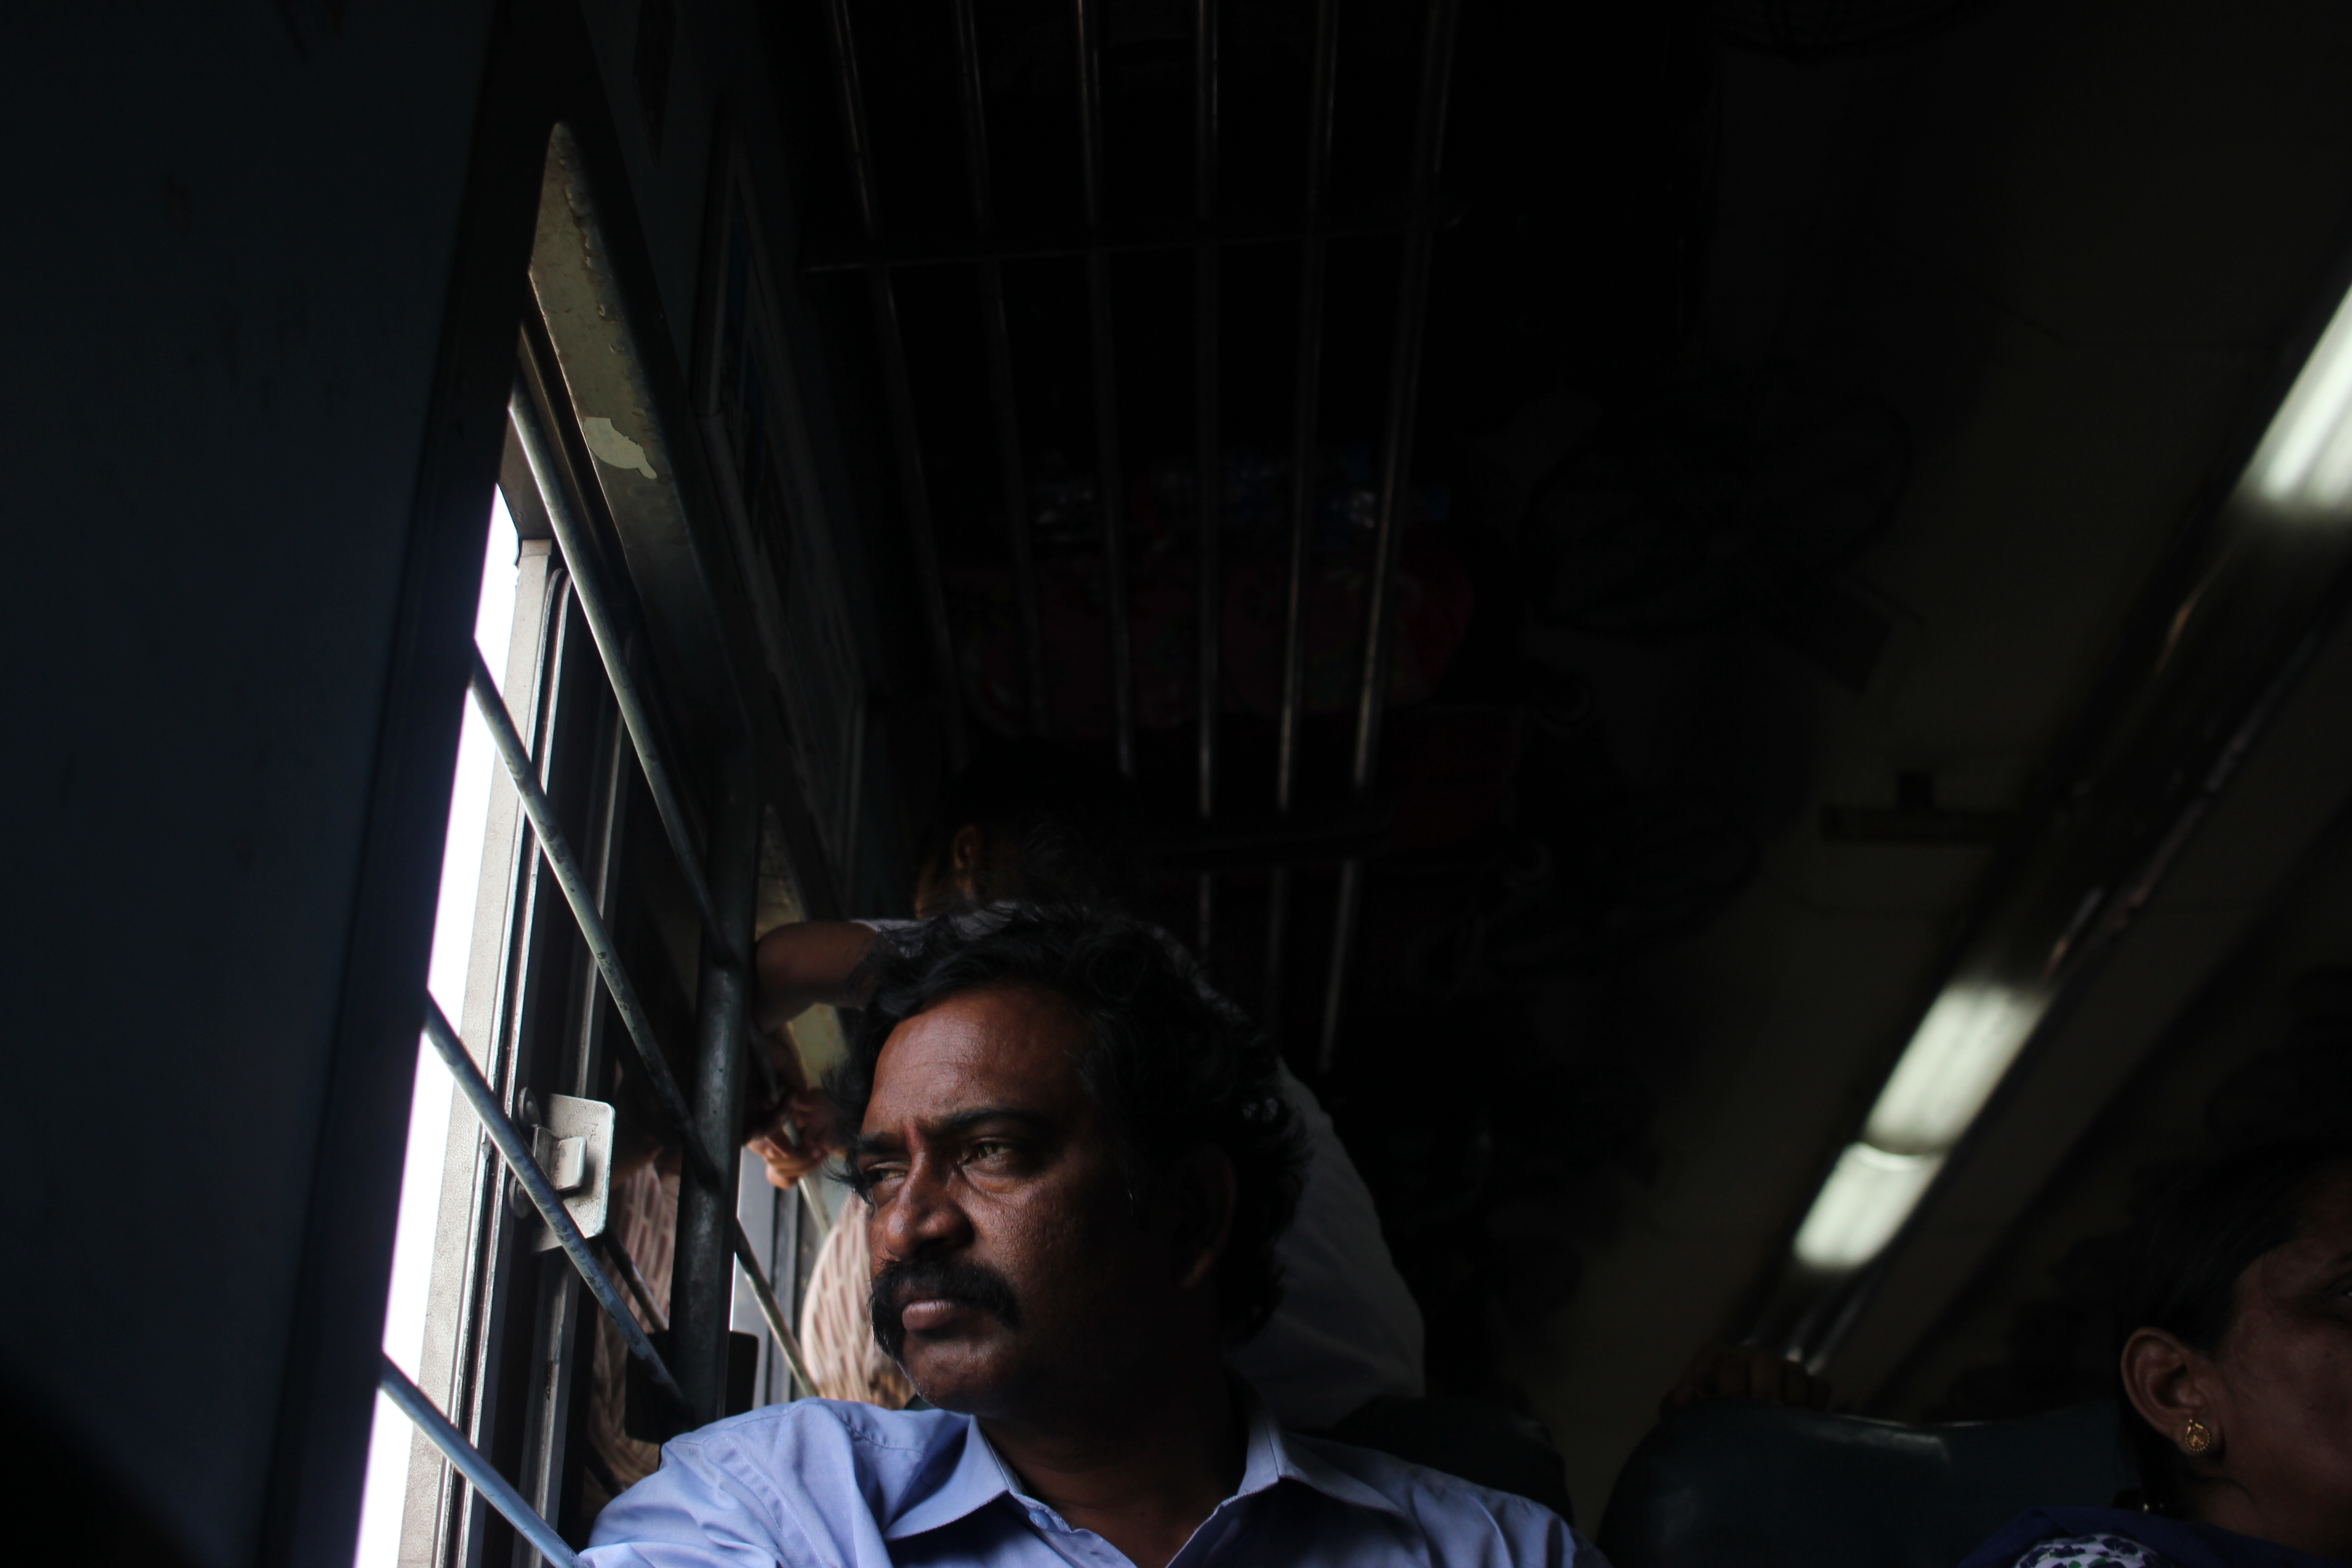 Railways, India, 2015